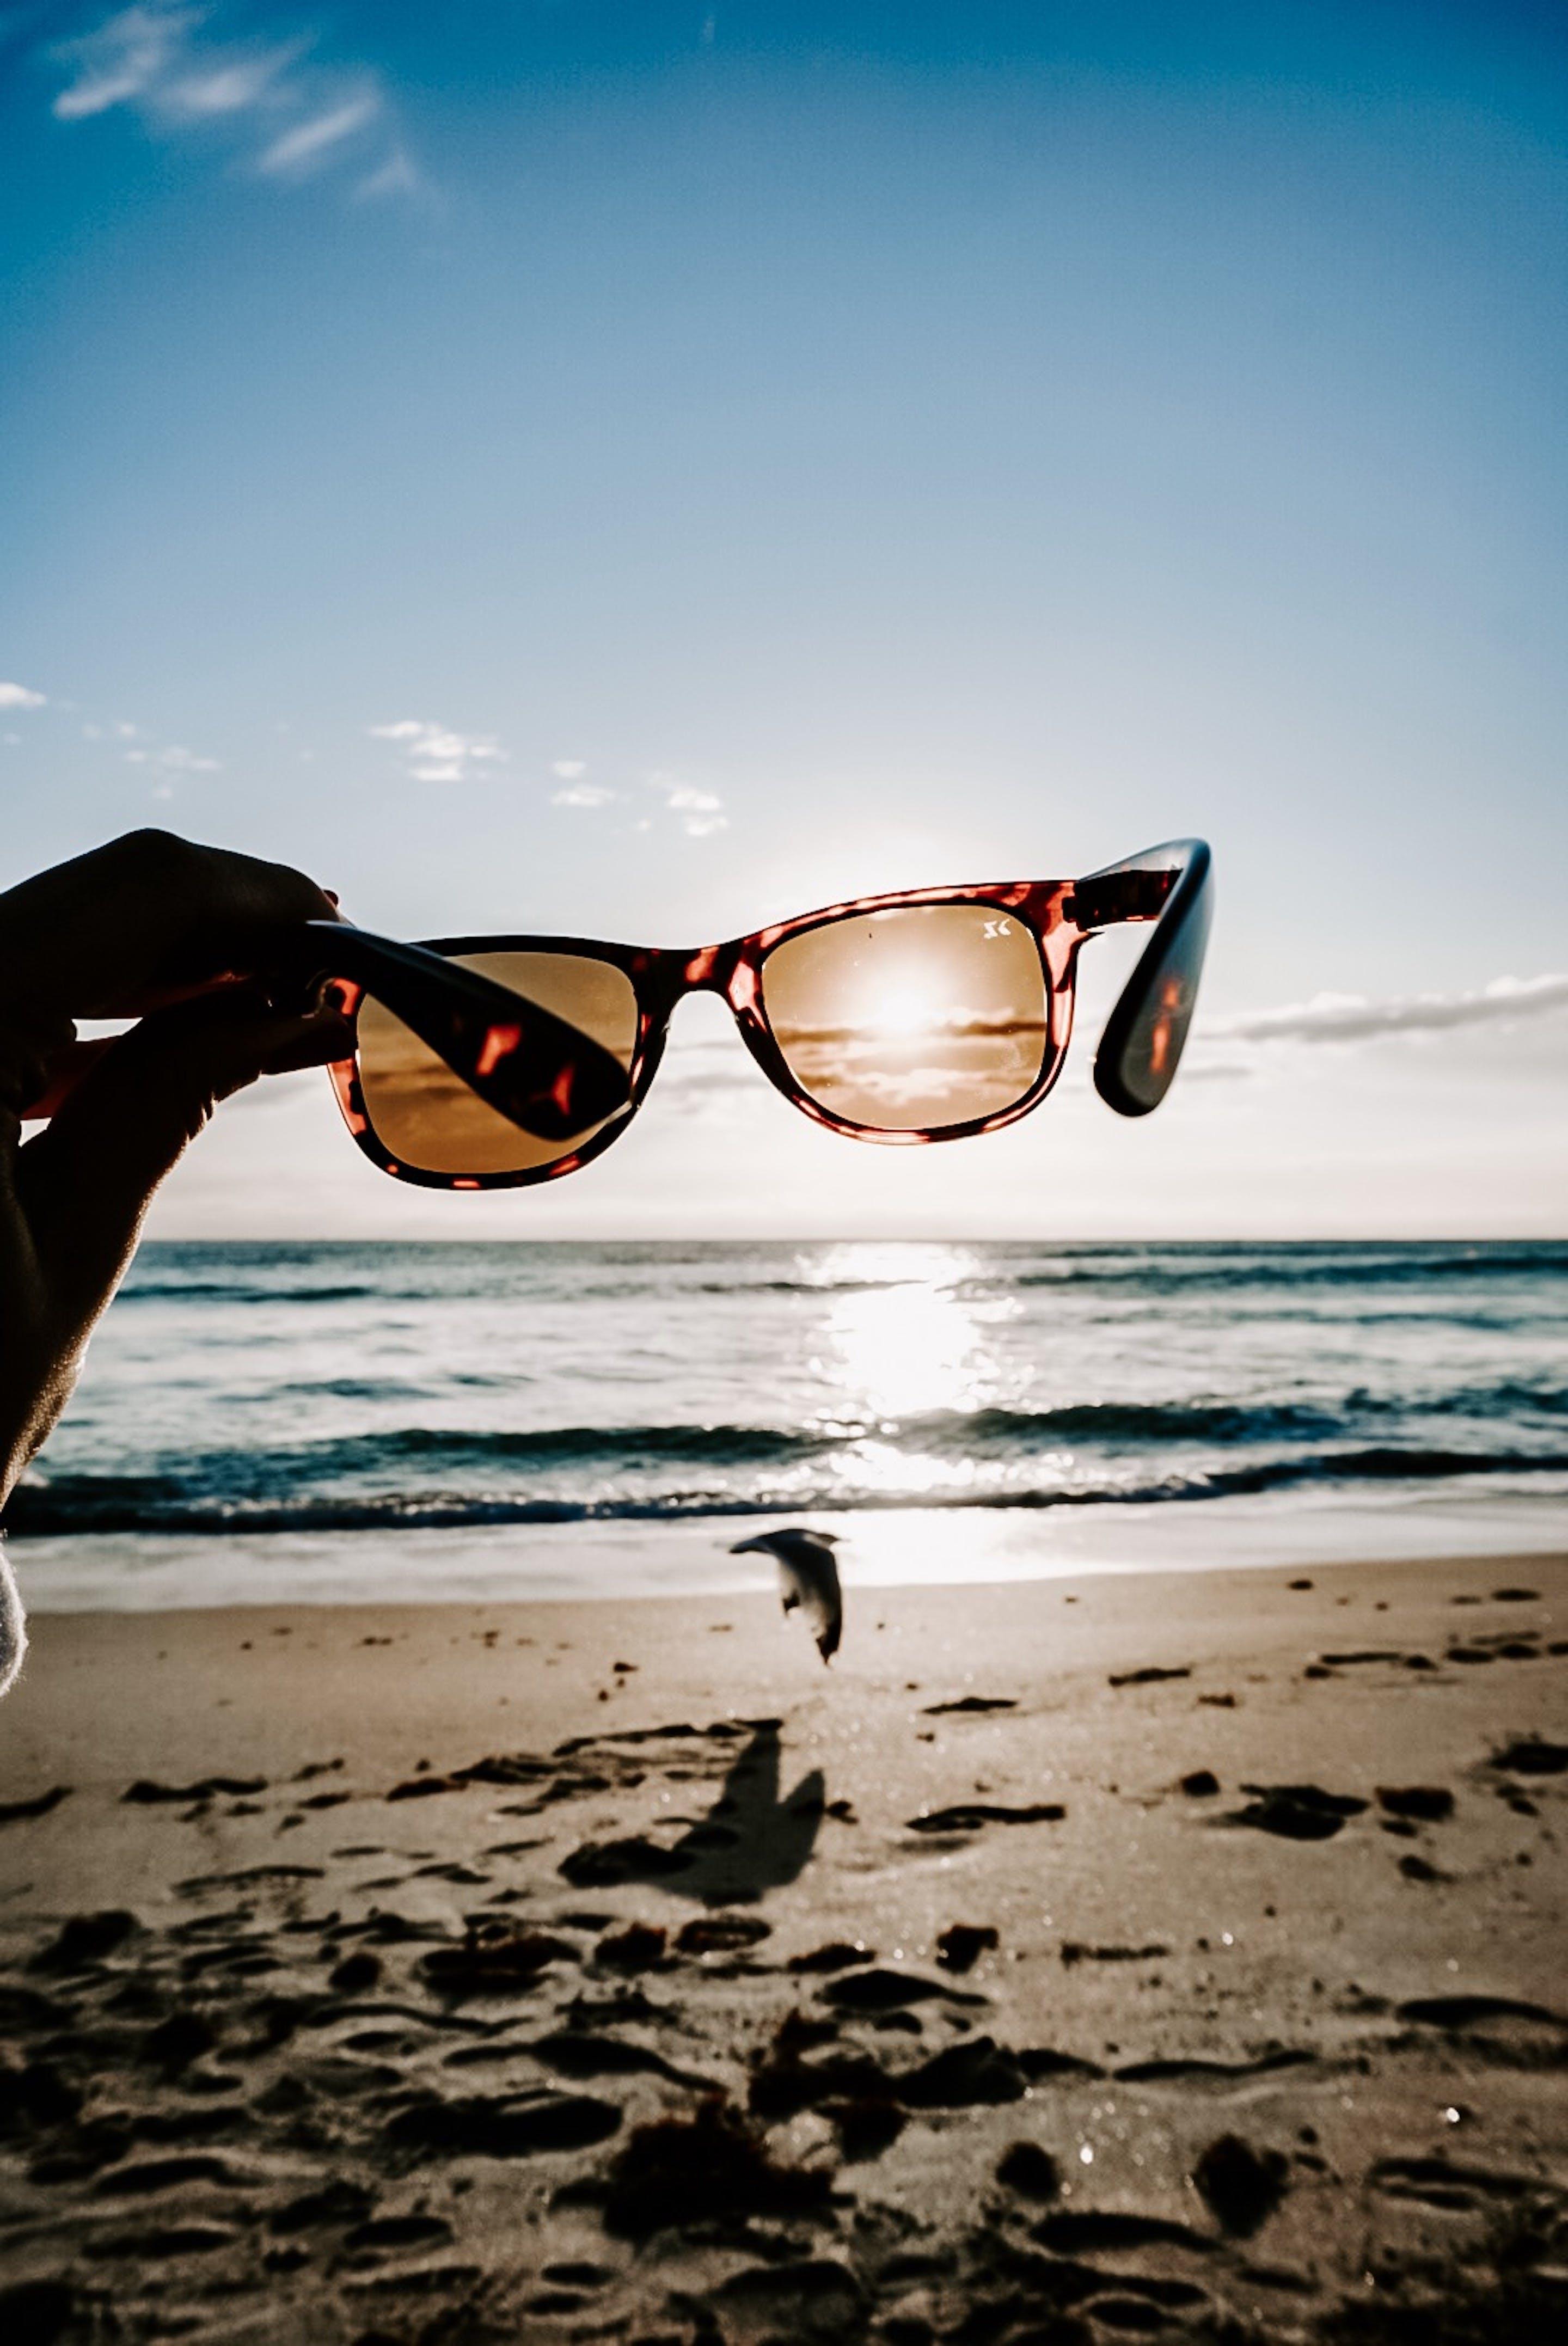 Kostenloses Stock Foto zu ferien, hand, horizont, meer